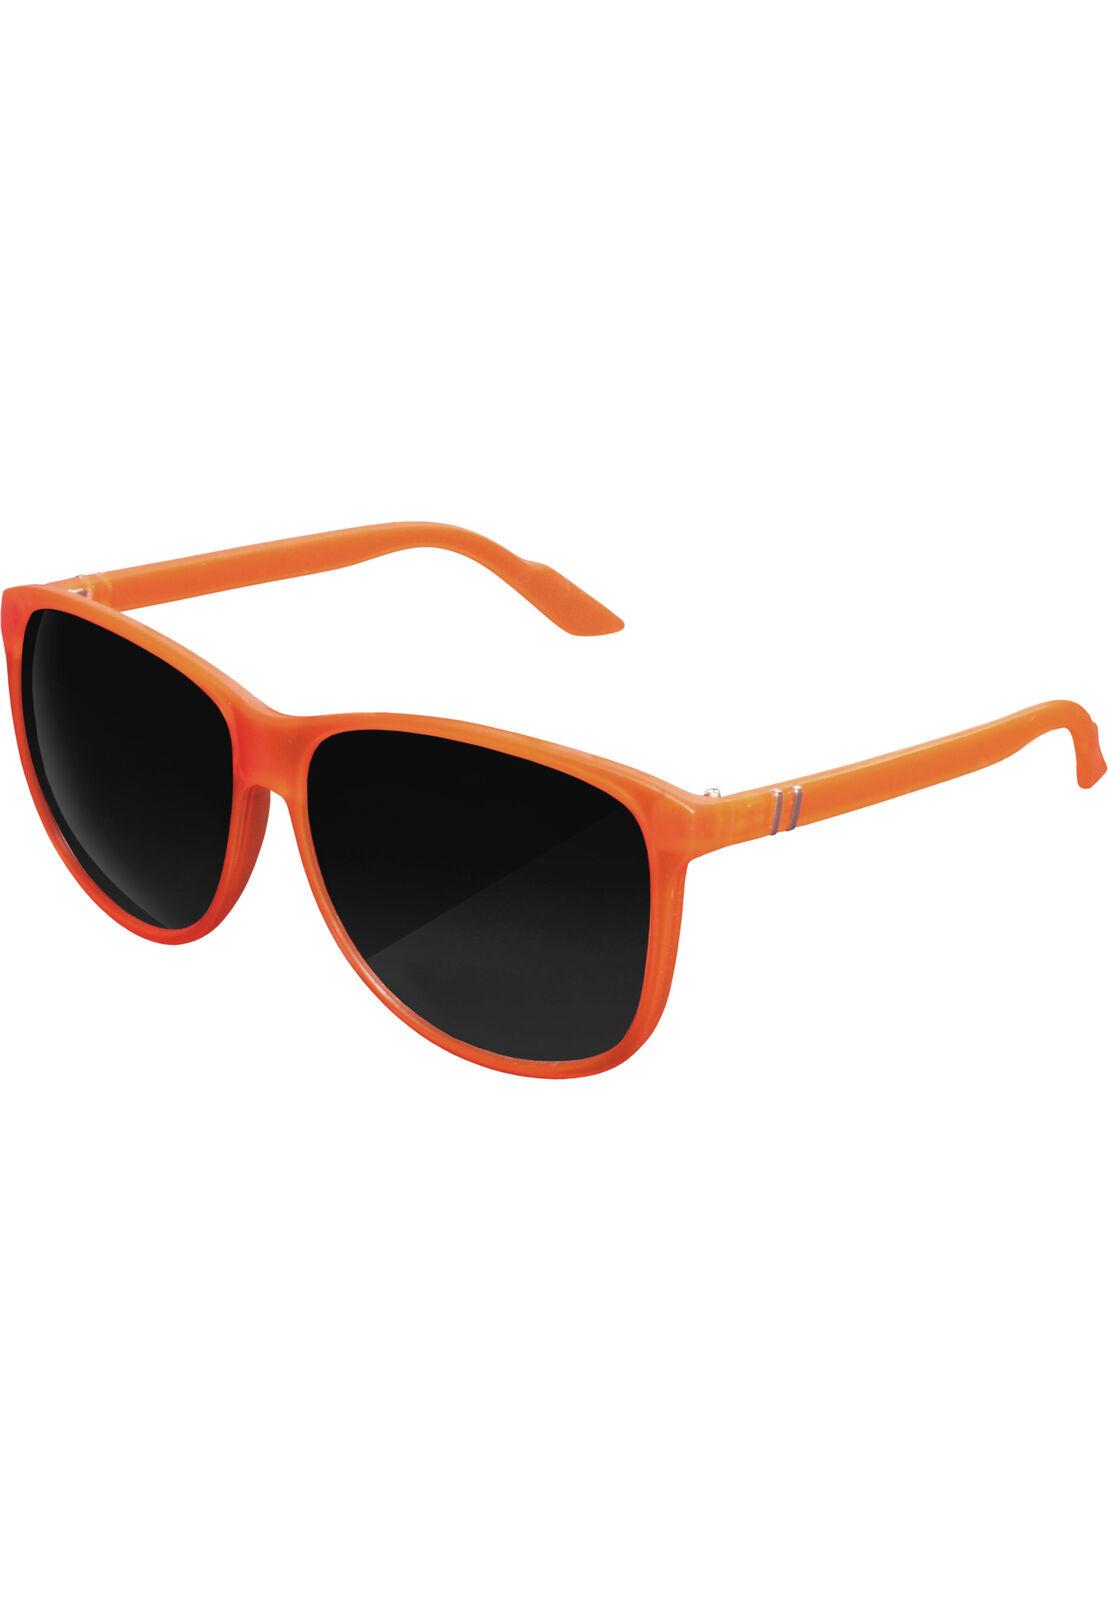 MSTRDS Herren Sonnenbrille Unisex Sunglasses Chirwa